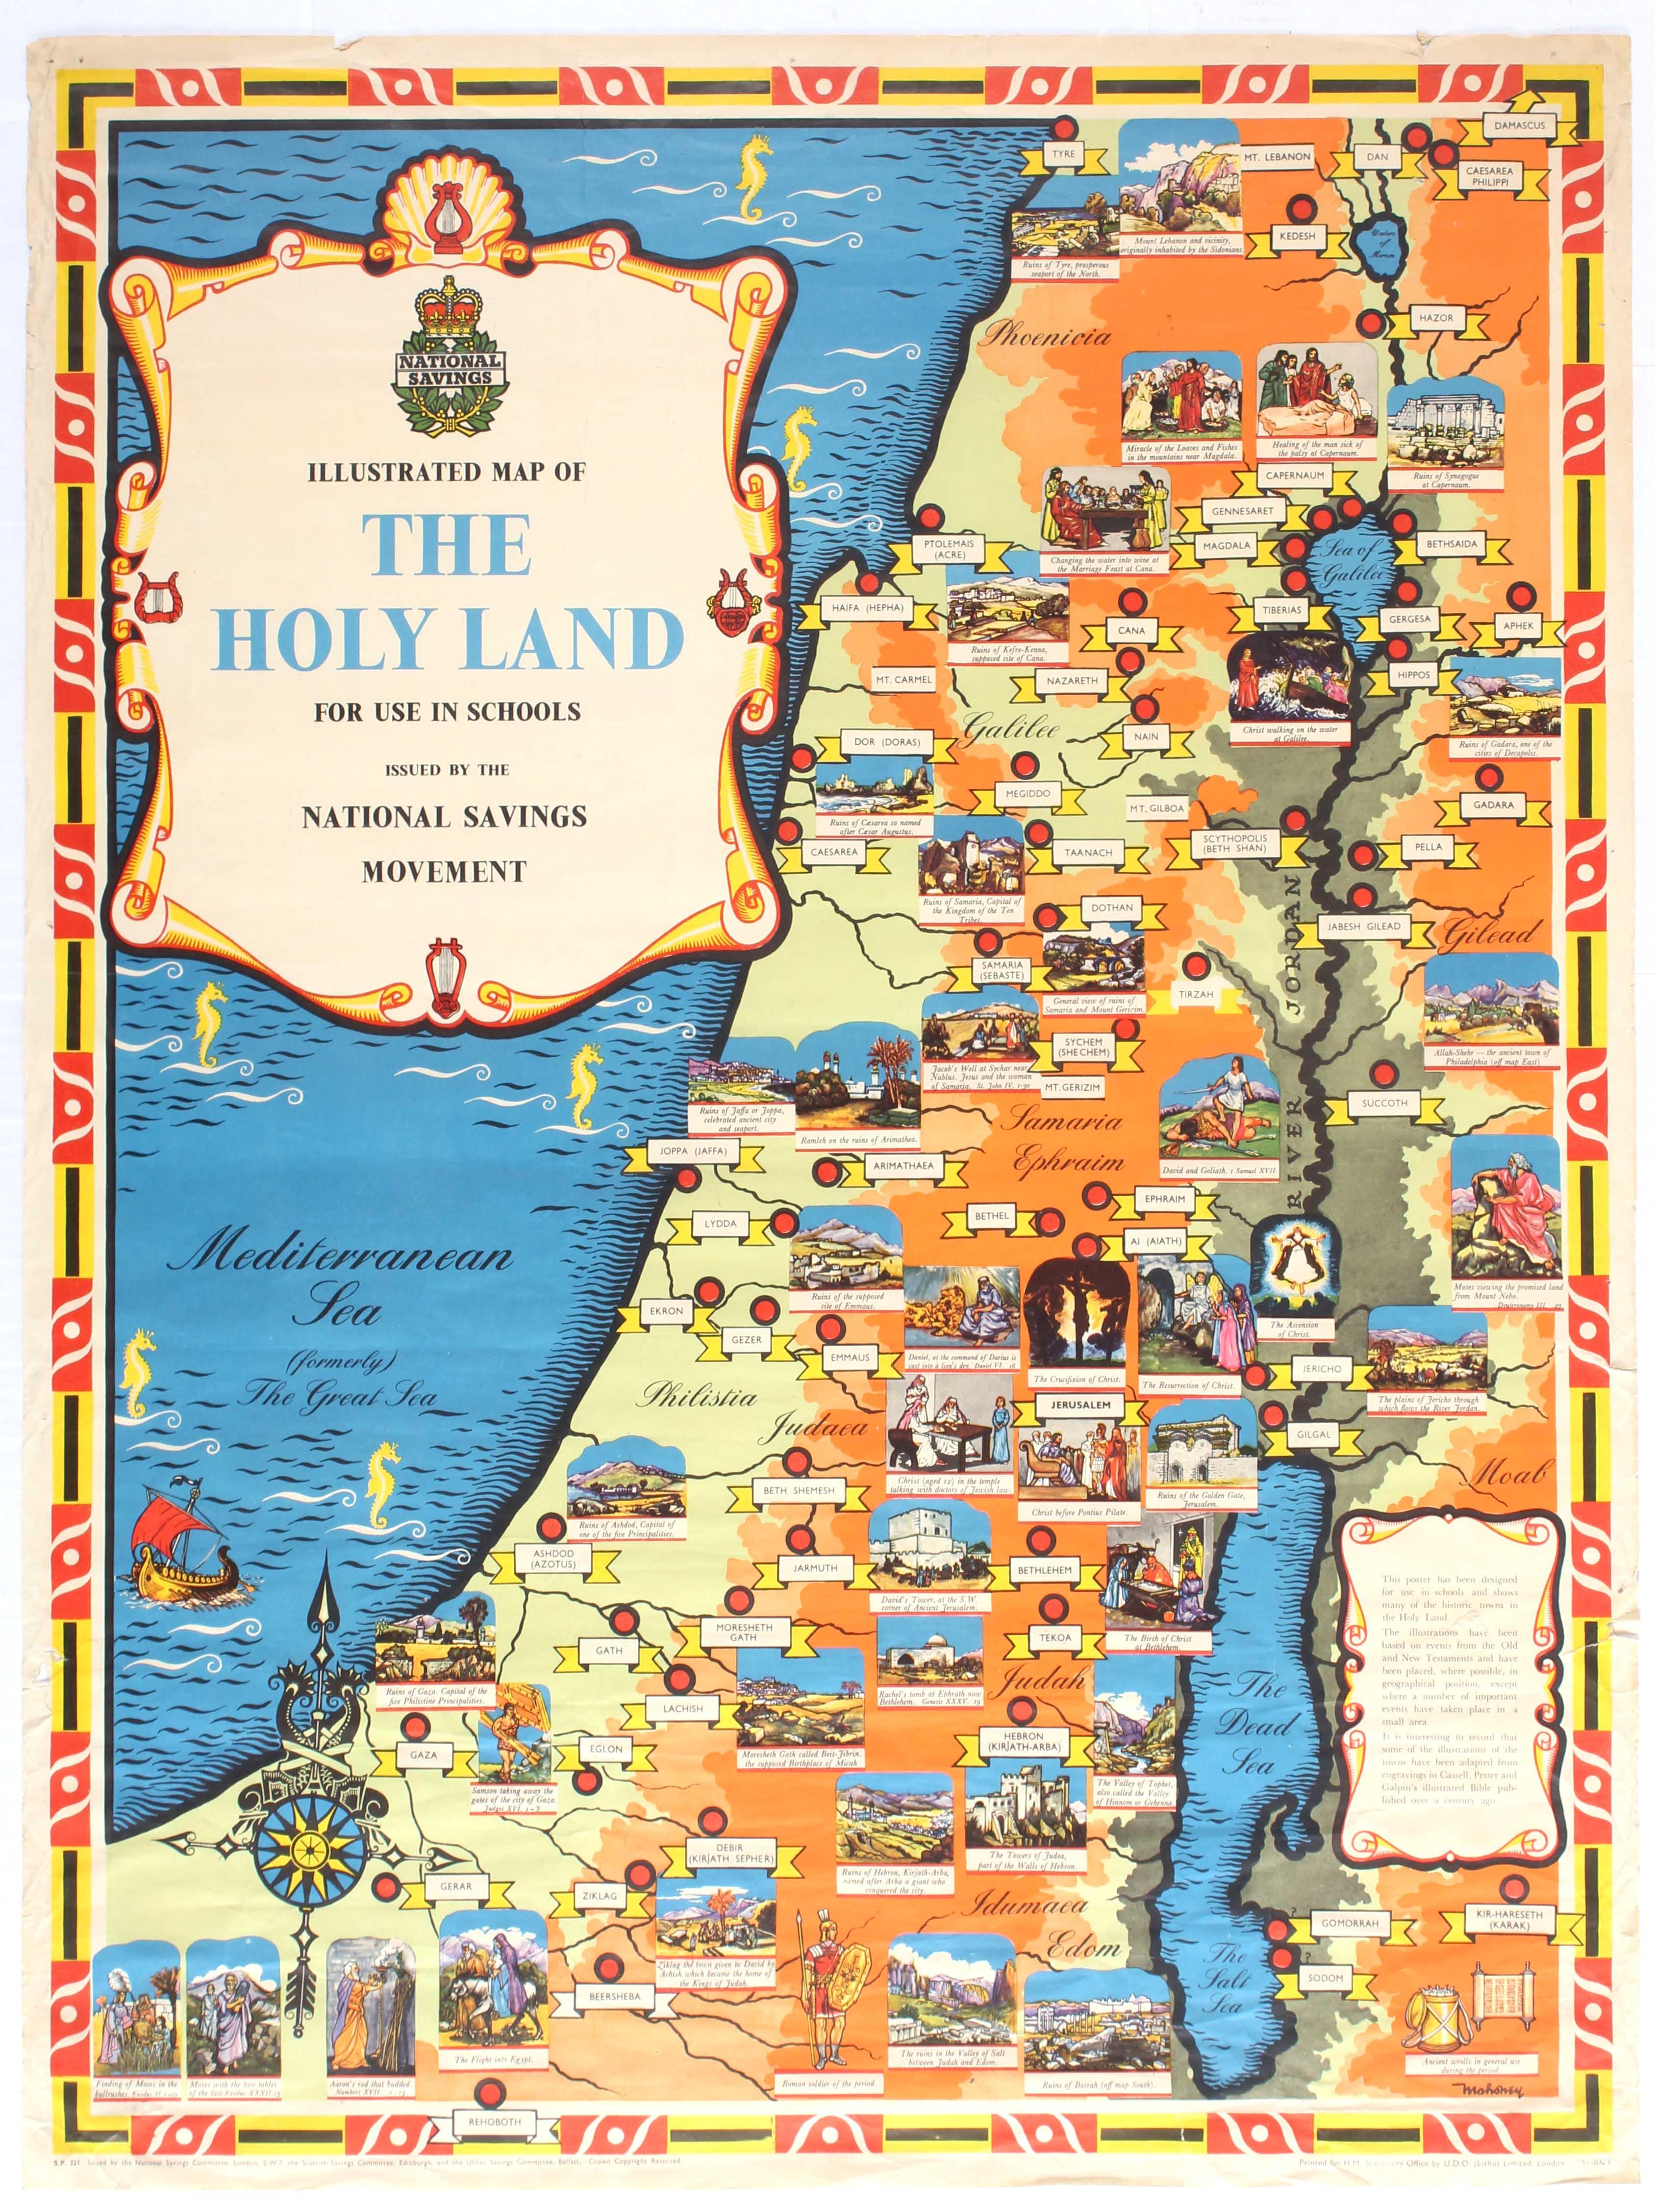 Lot 1308 - Advertising Poster Israel National Savings